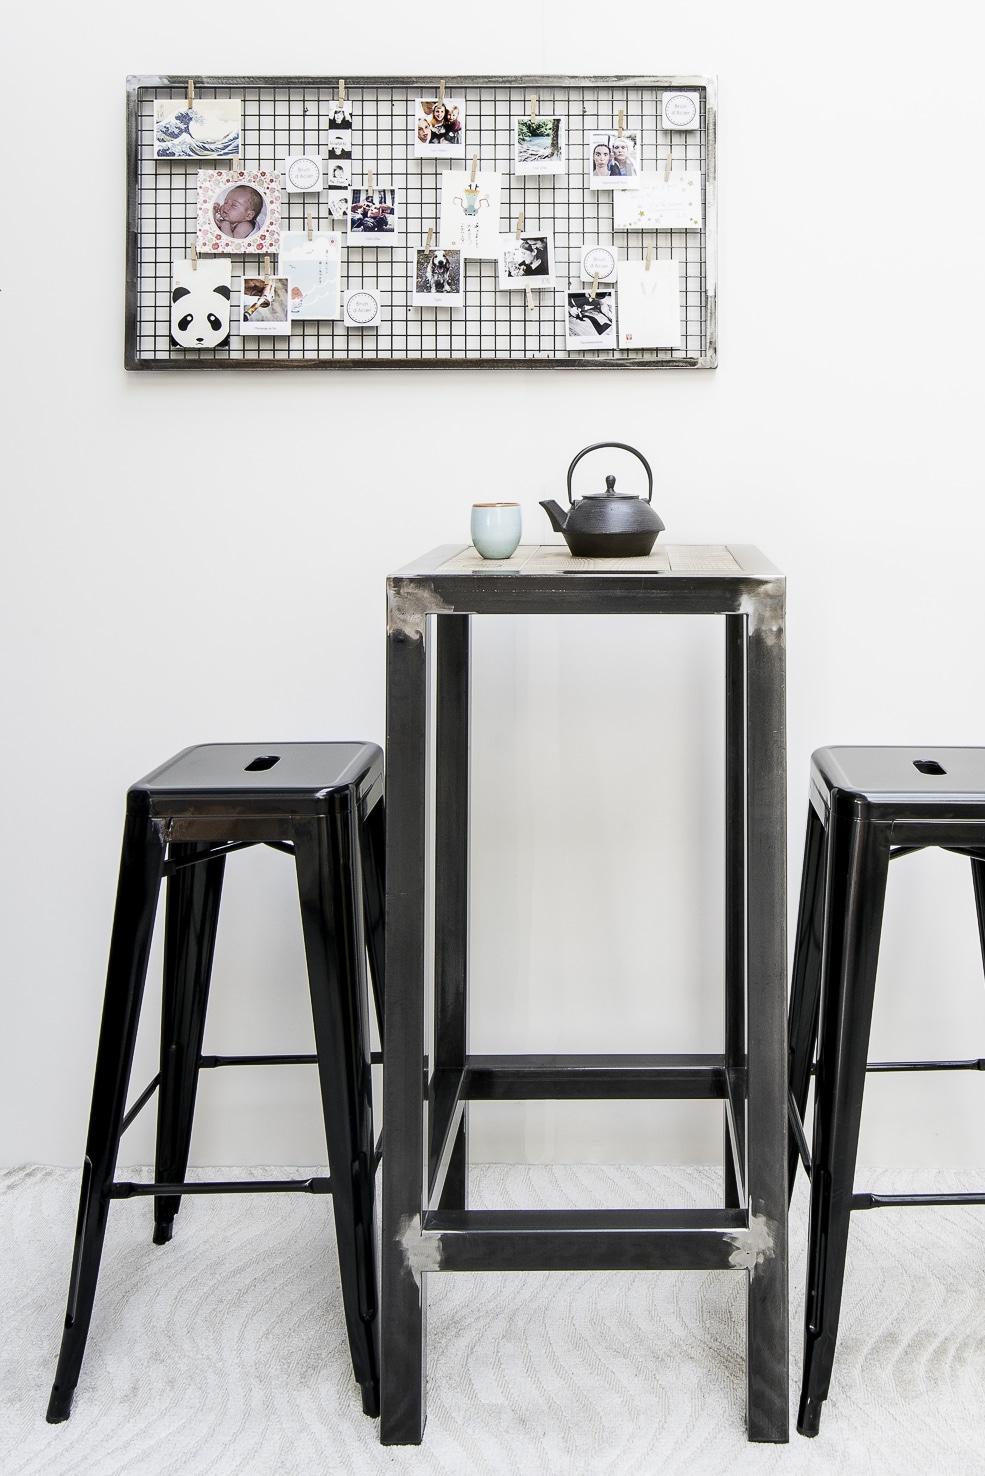 table haute industrielle mange debout winnipeg en acier. Black Bedroom Furniture Sets. Home Design Ideas